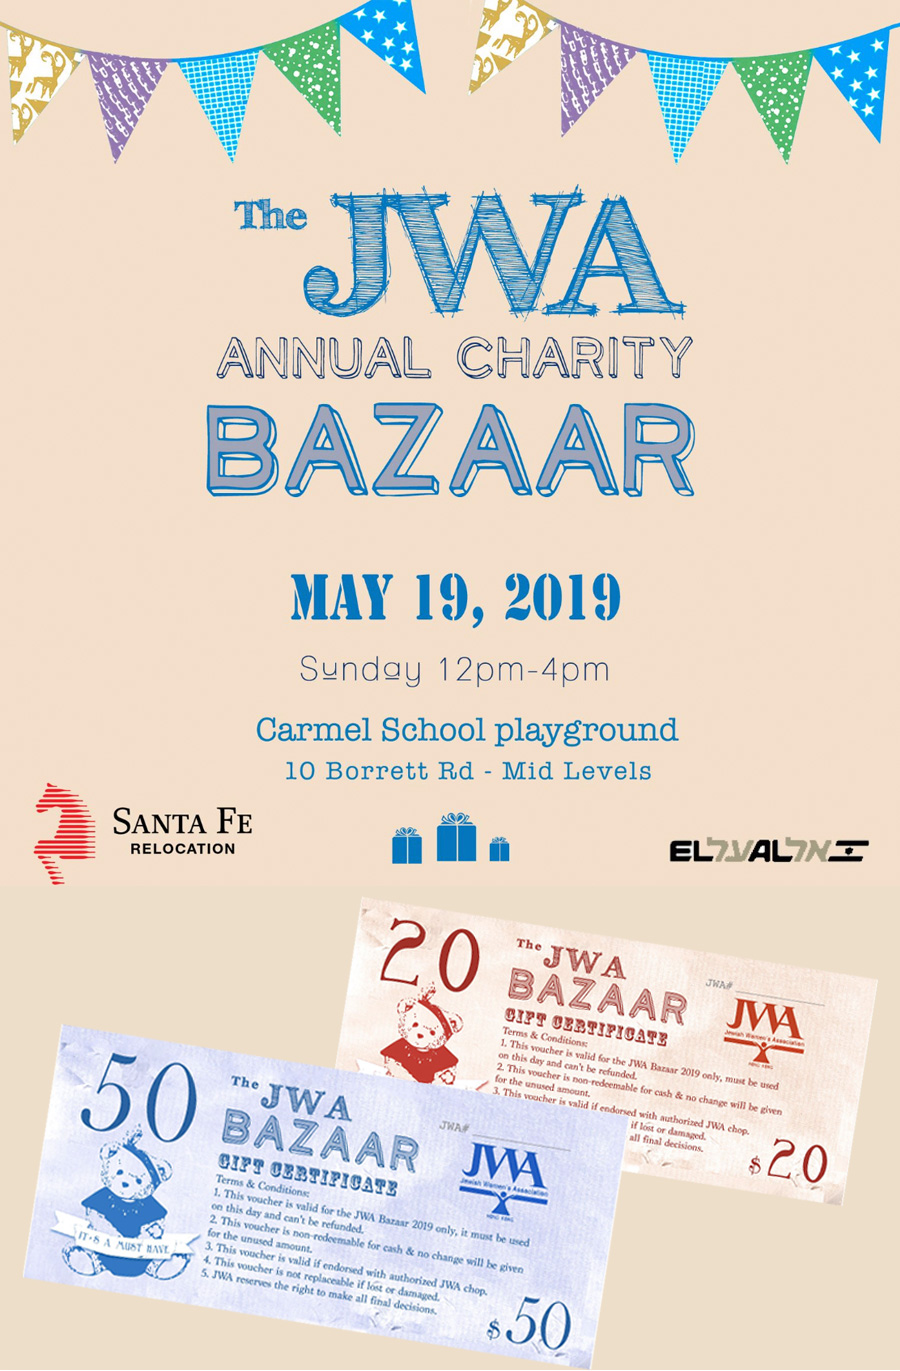 Bazaar Certificates available now!